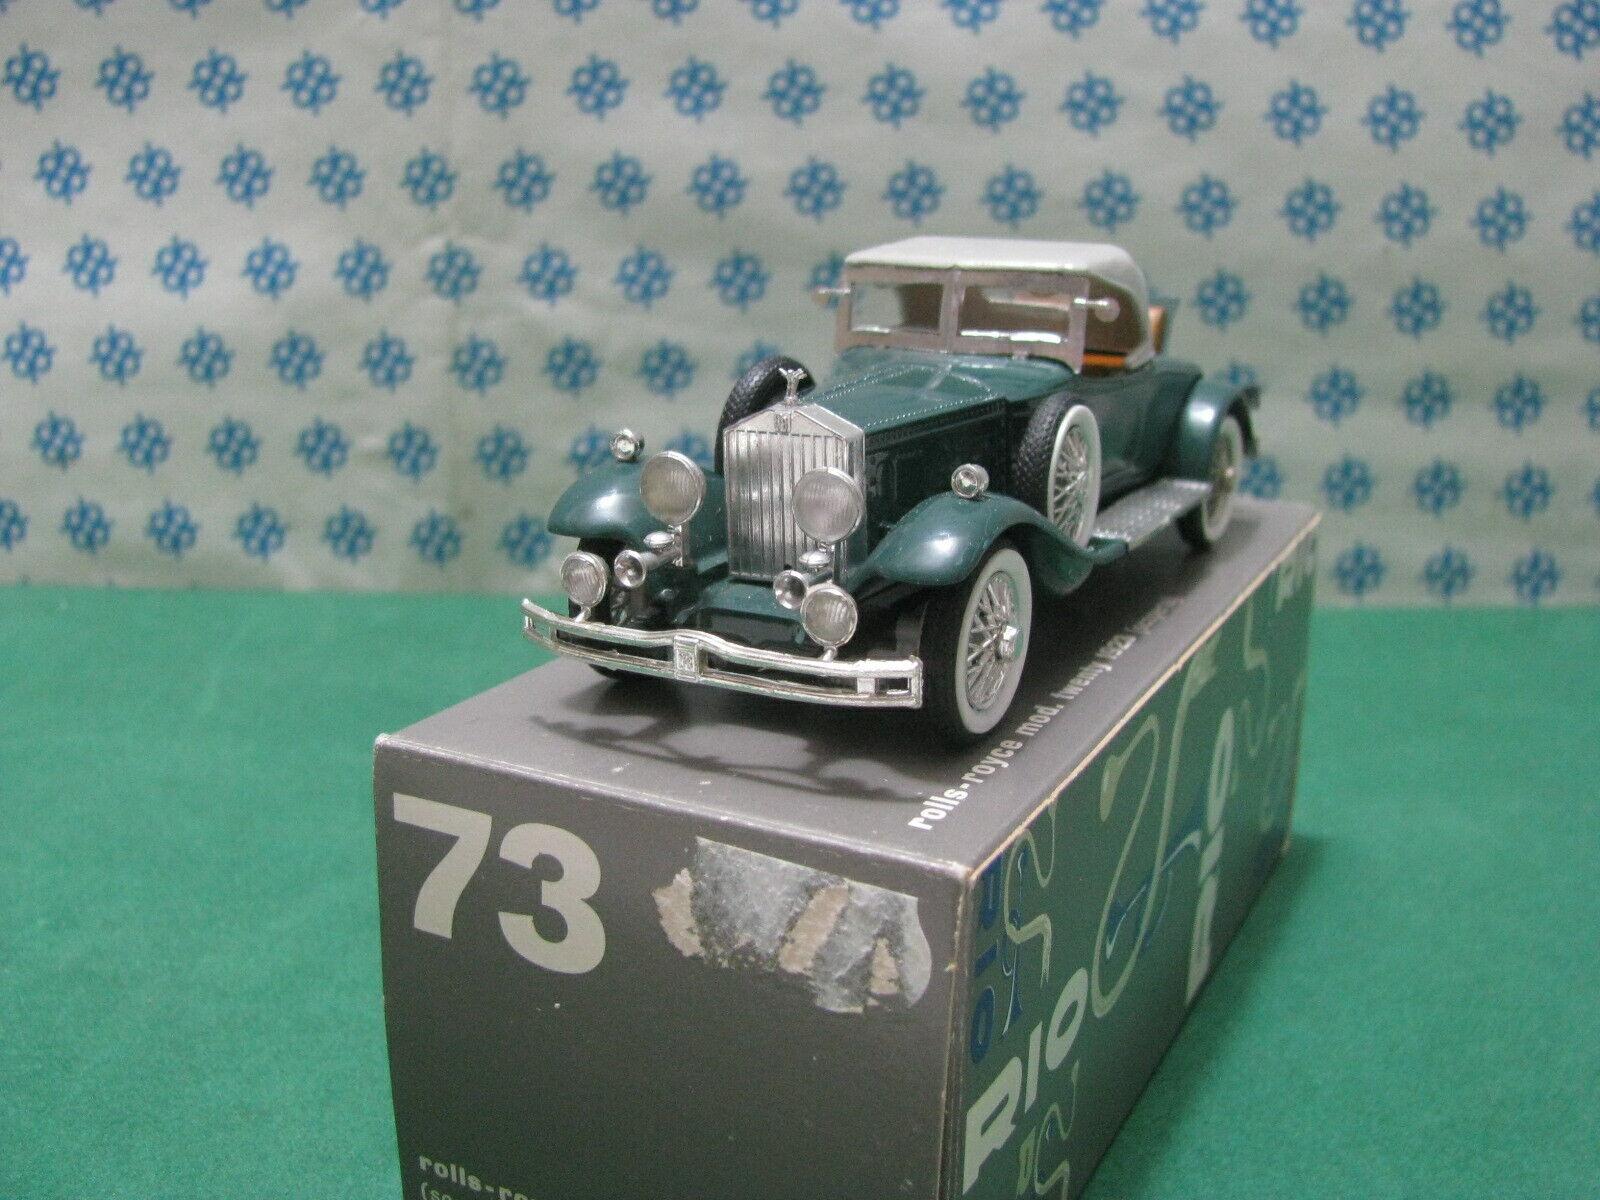 Vintage -  ROLLS-ROYCE 1931   -  1 43  Rio n°73  Mint Box